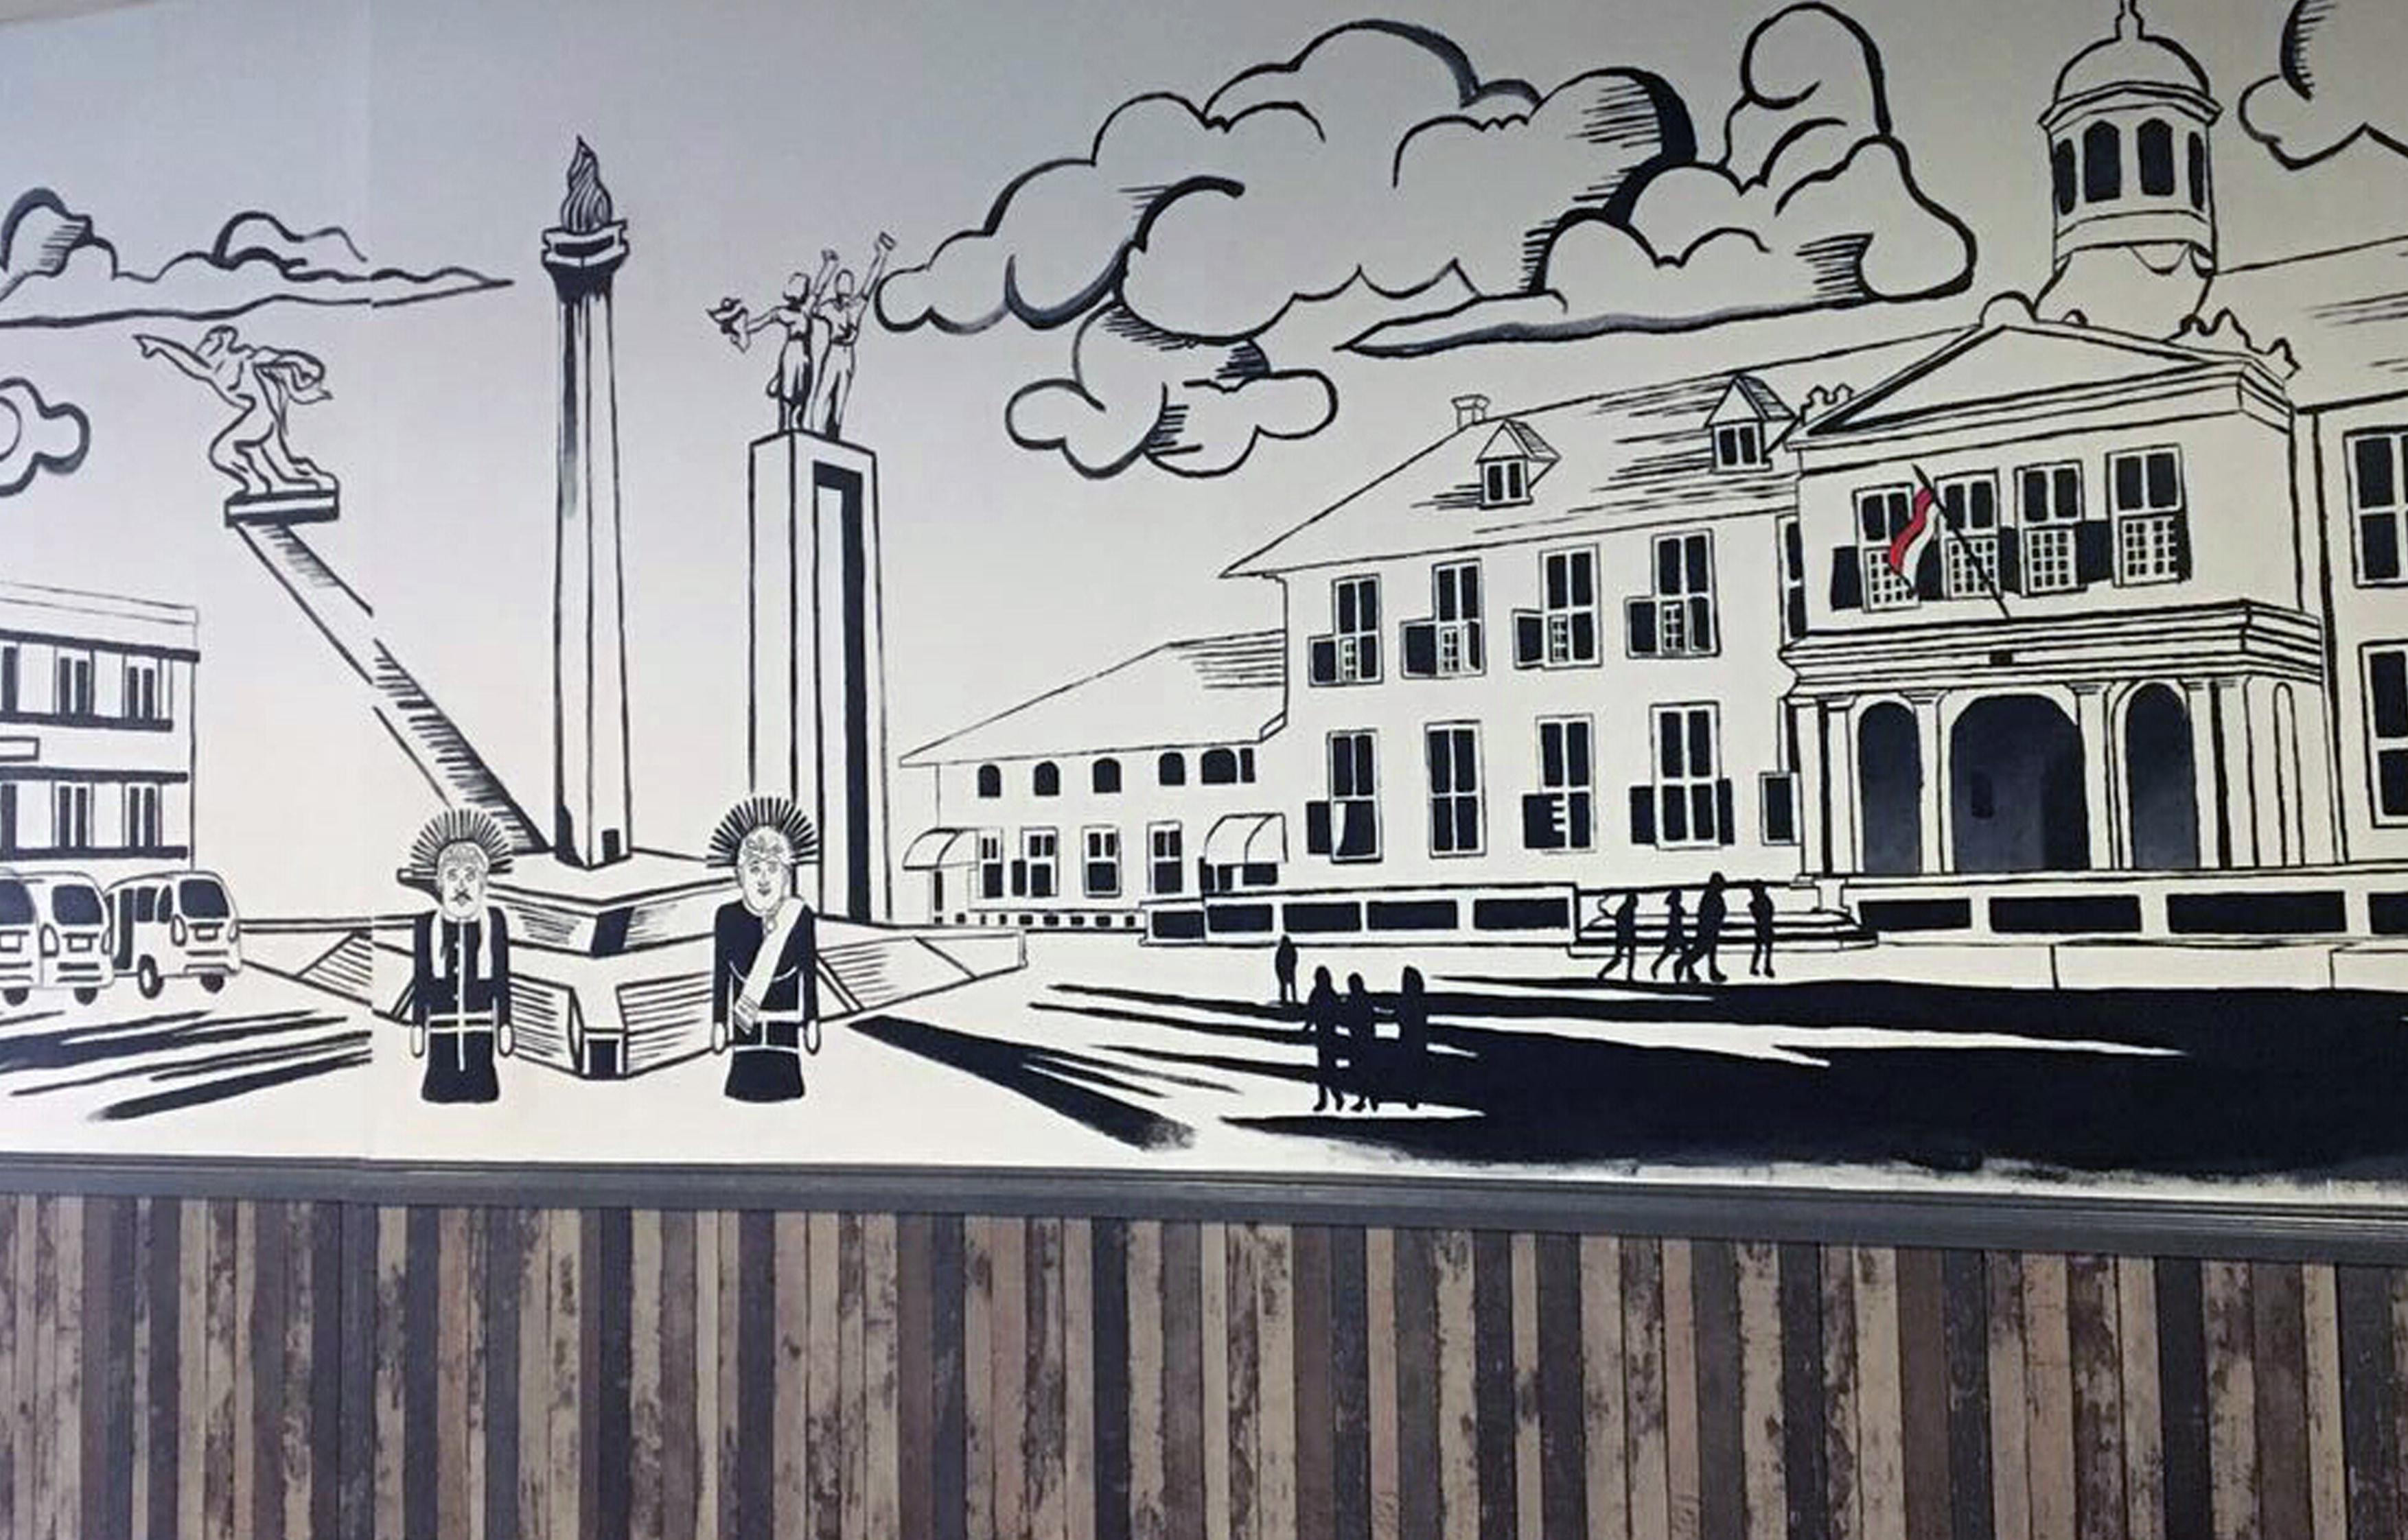 IndoMural Jasa Lukis Dinding Indonesia Mural Profesional